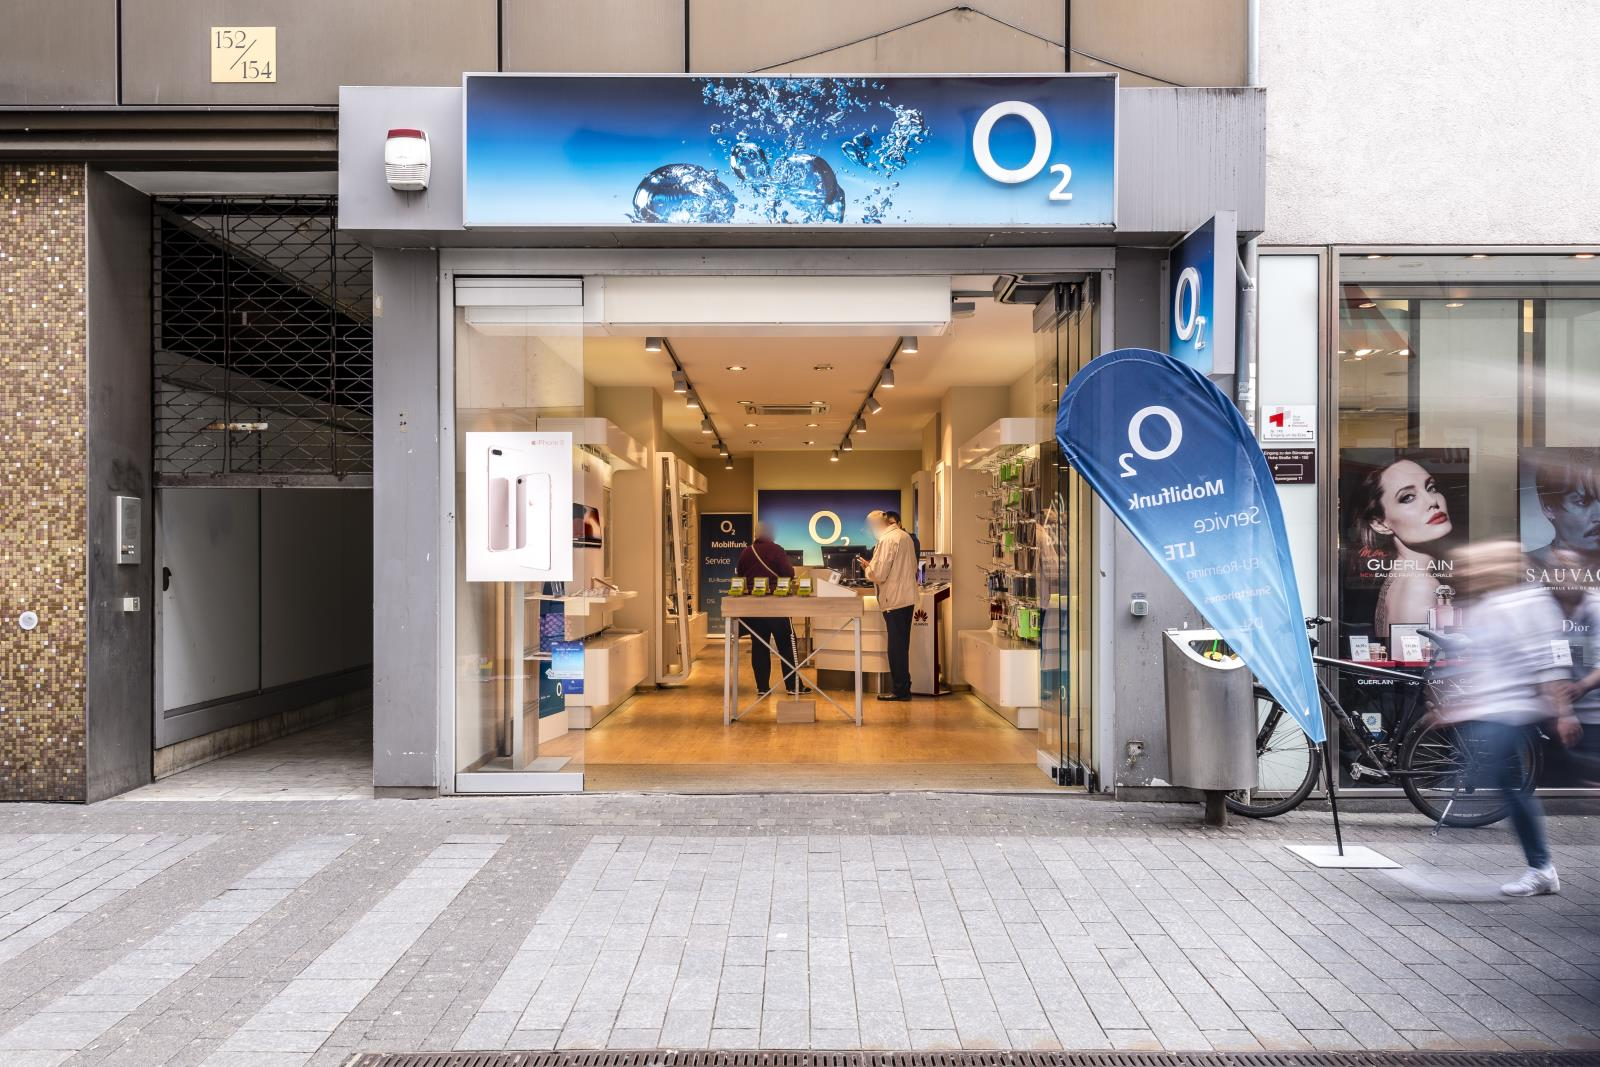 o2 Shop, Hohe Straße 152 in Köln